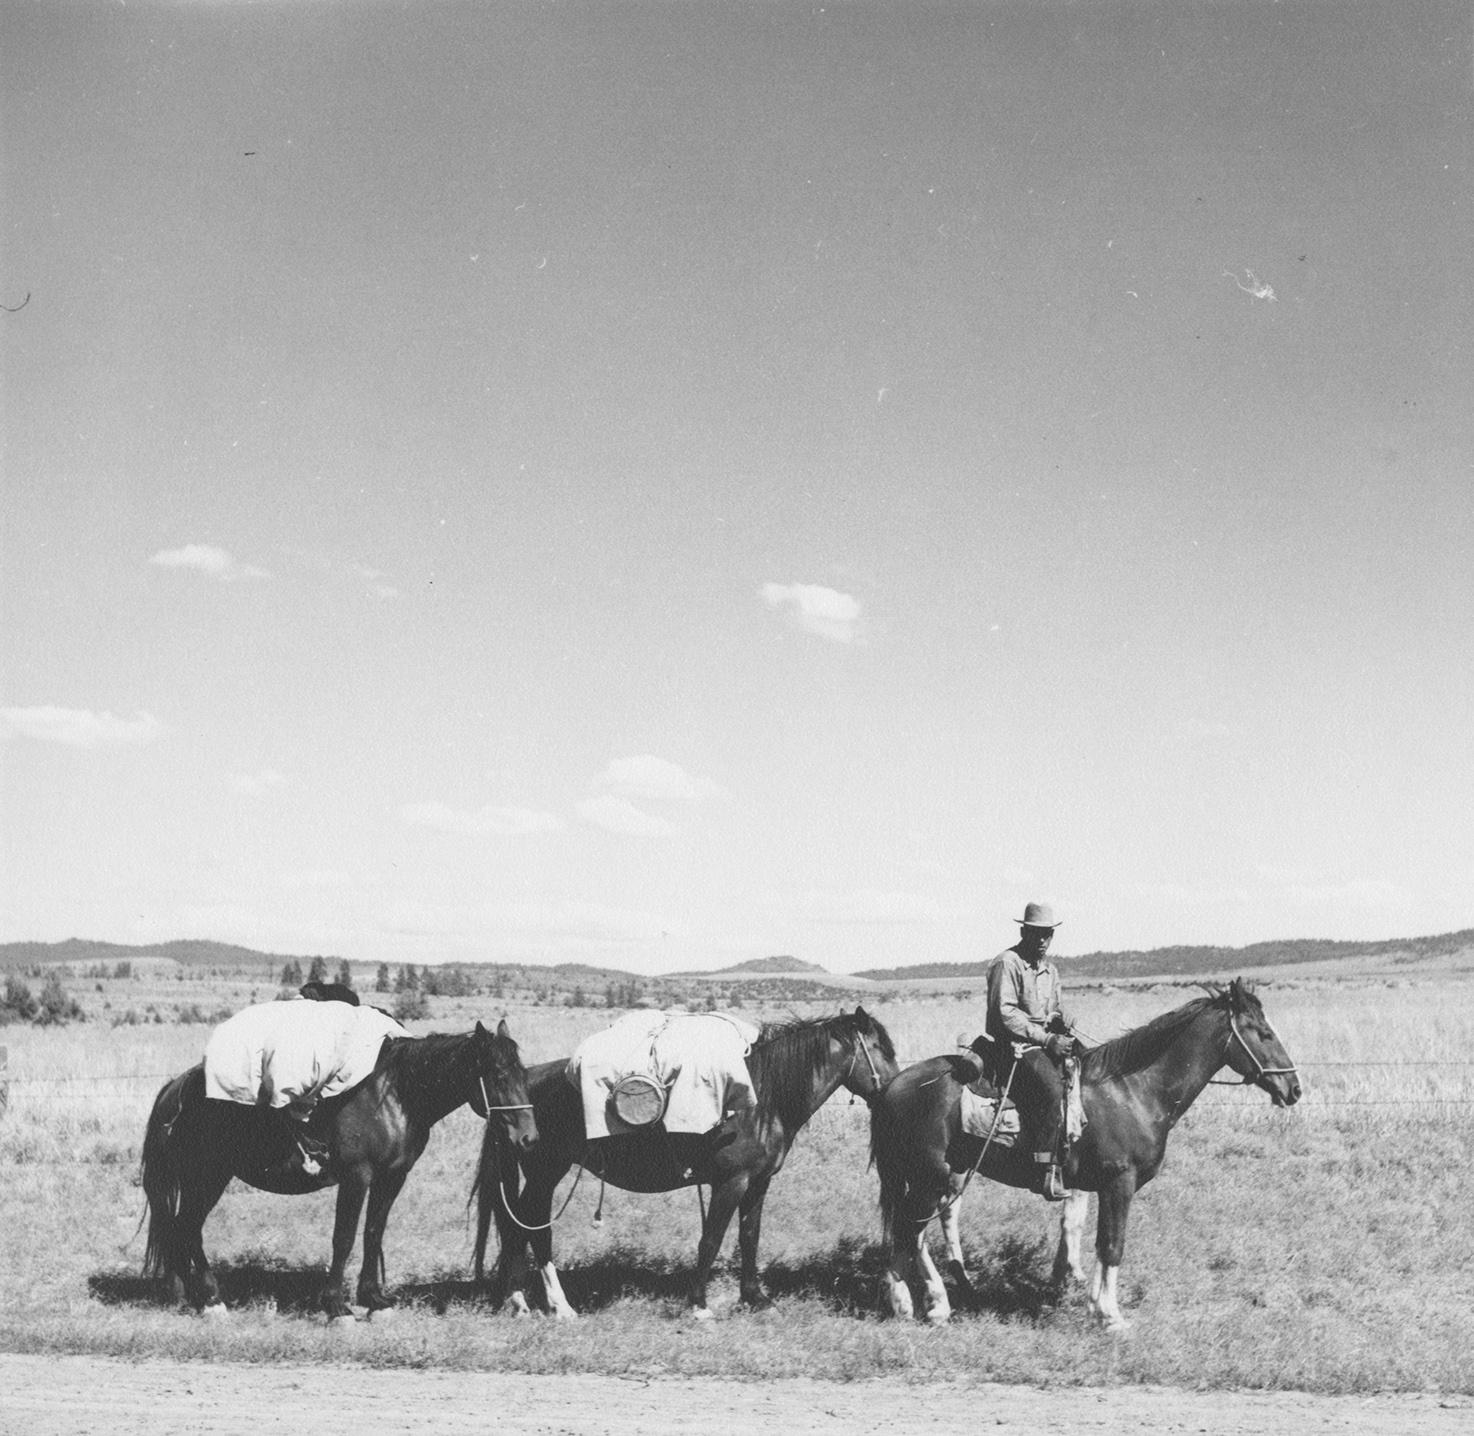 Arthur Rothstein: Sheep herder on trail, Madras, Ore., July 1936